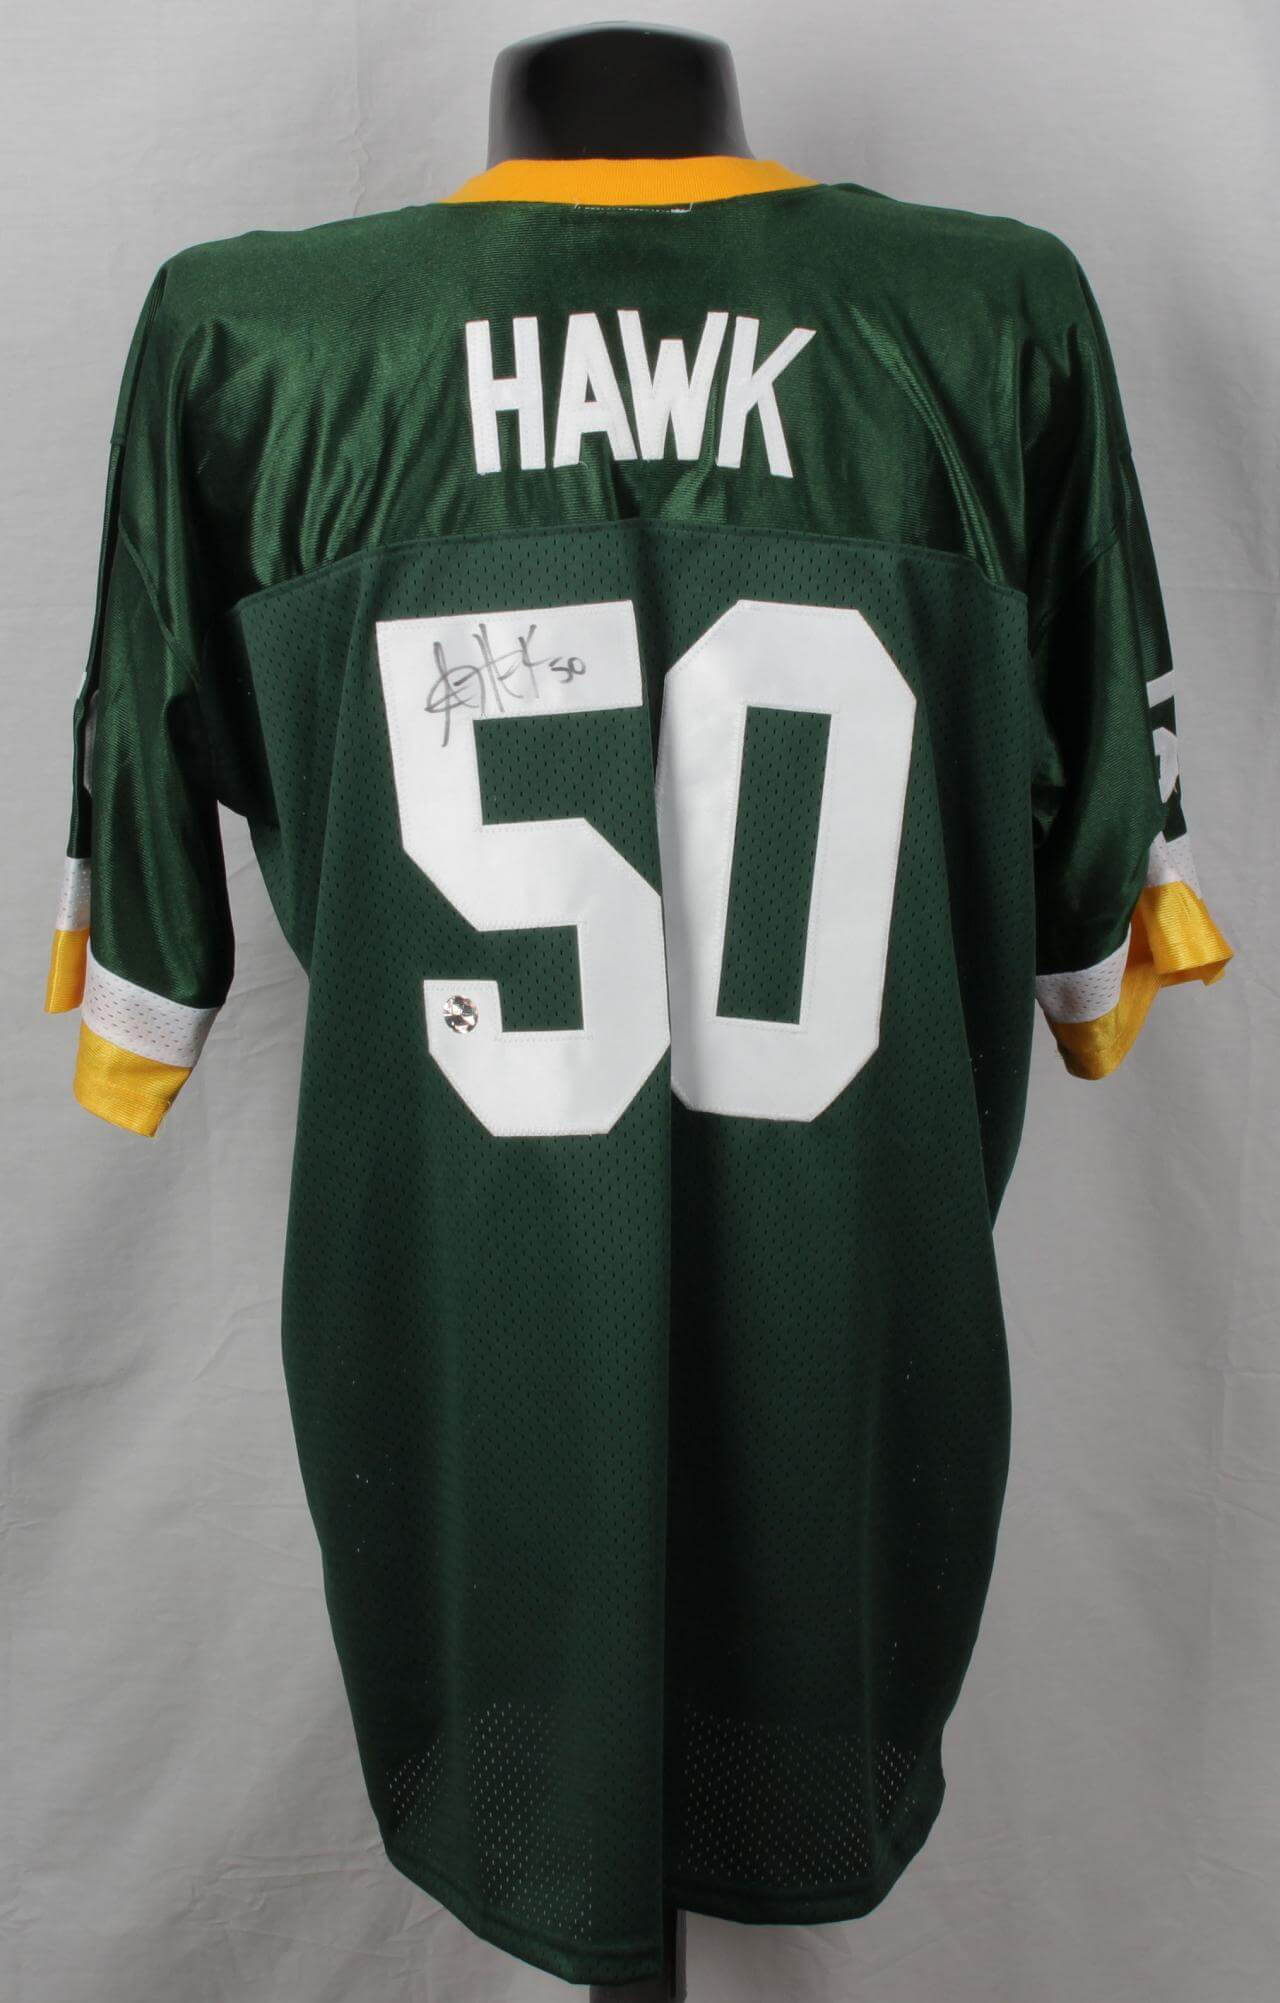 aj hawk jersey